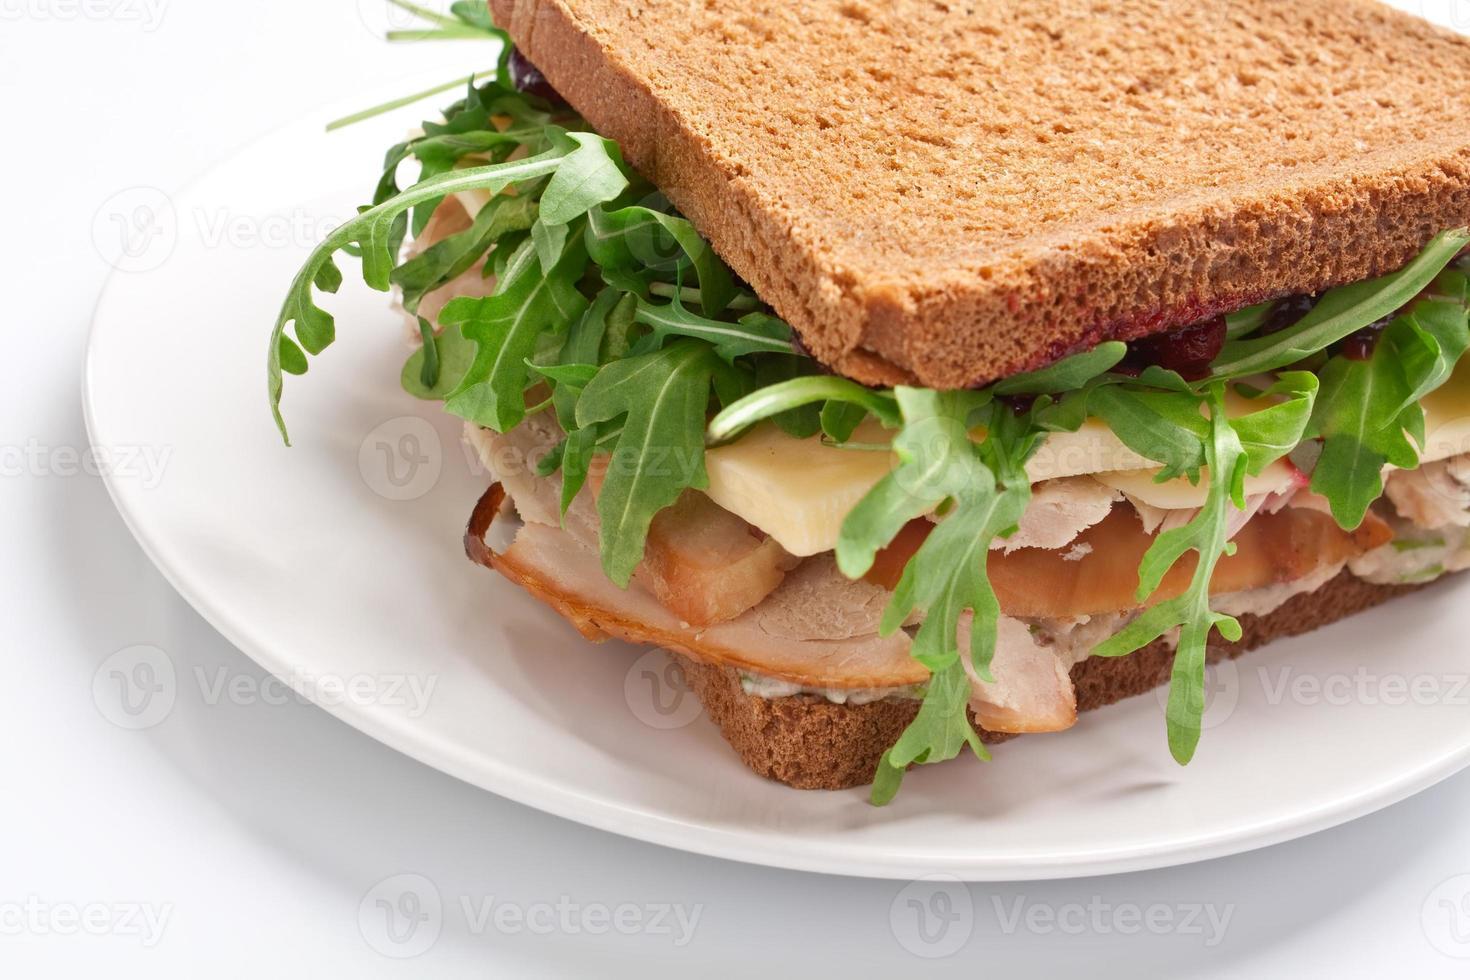 Whole wheat healthy  sandwich photo